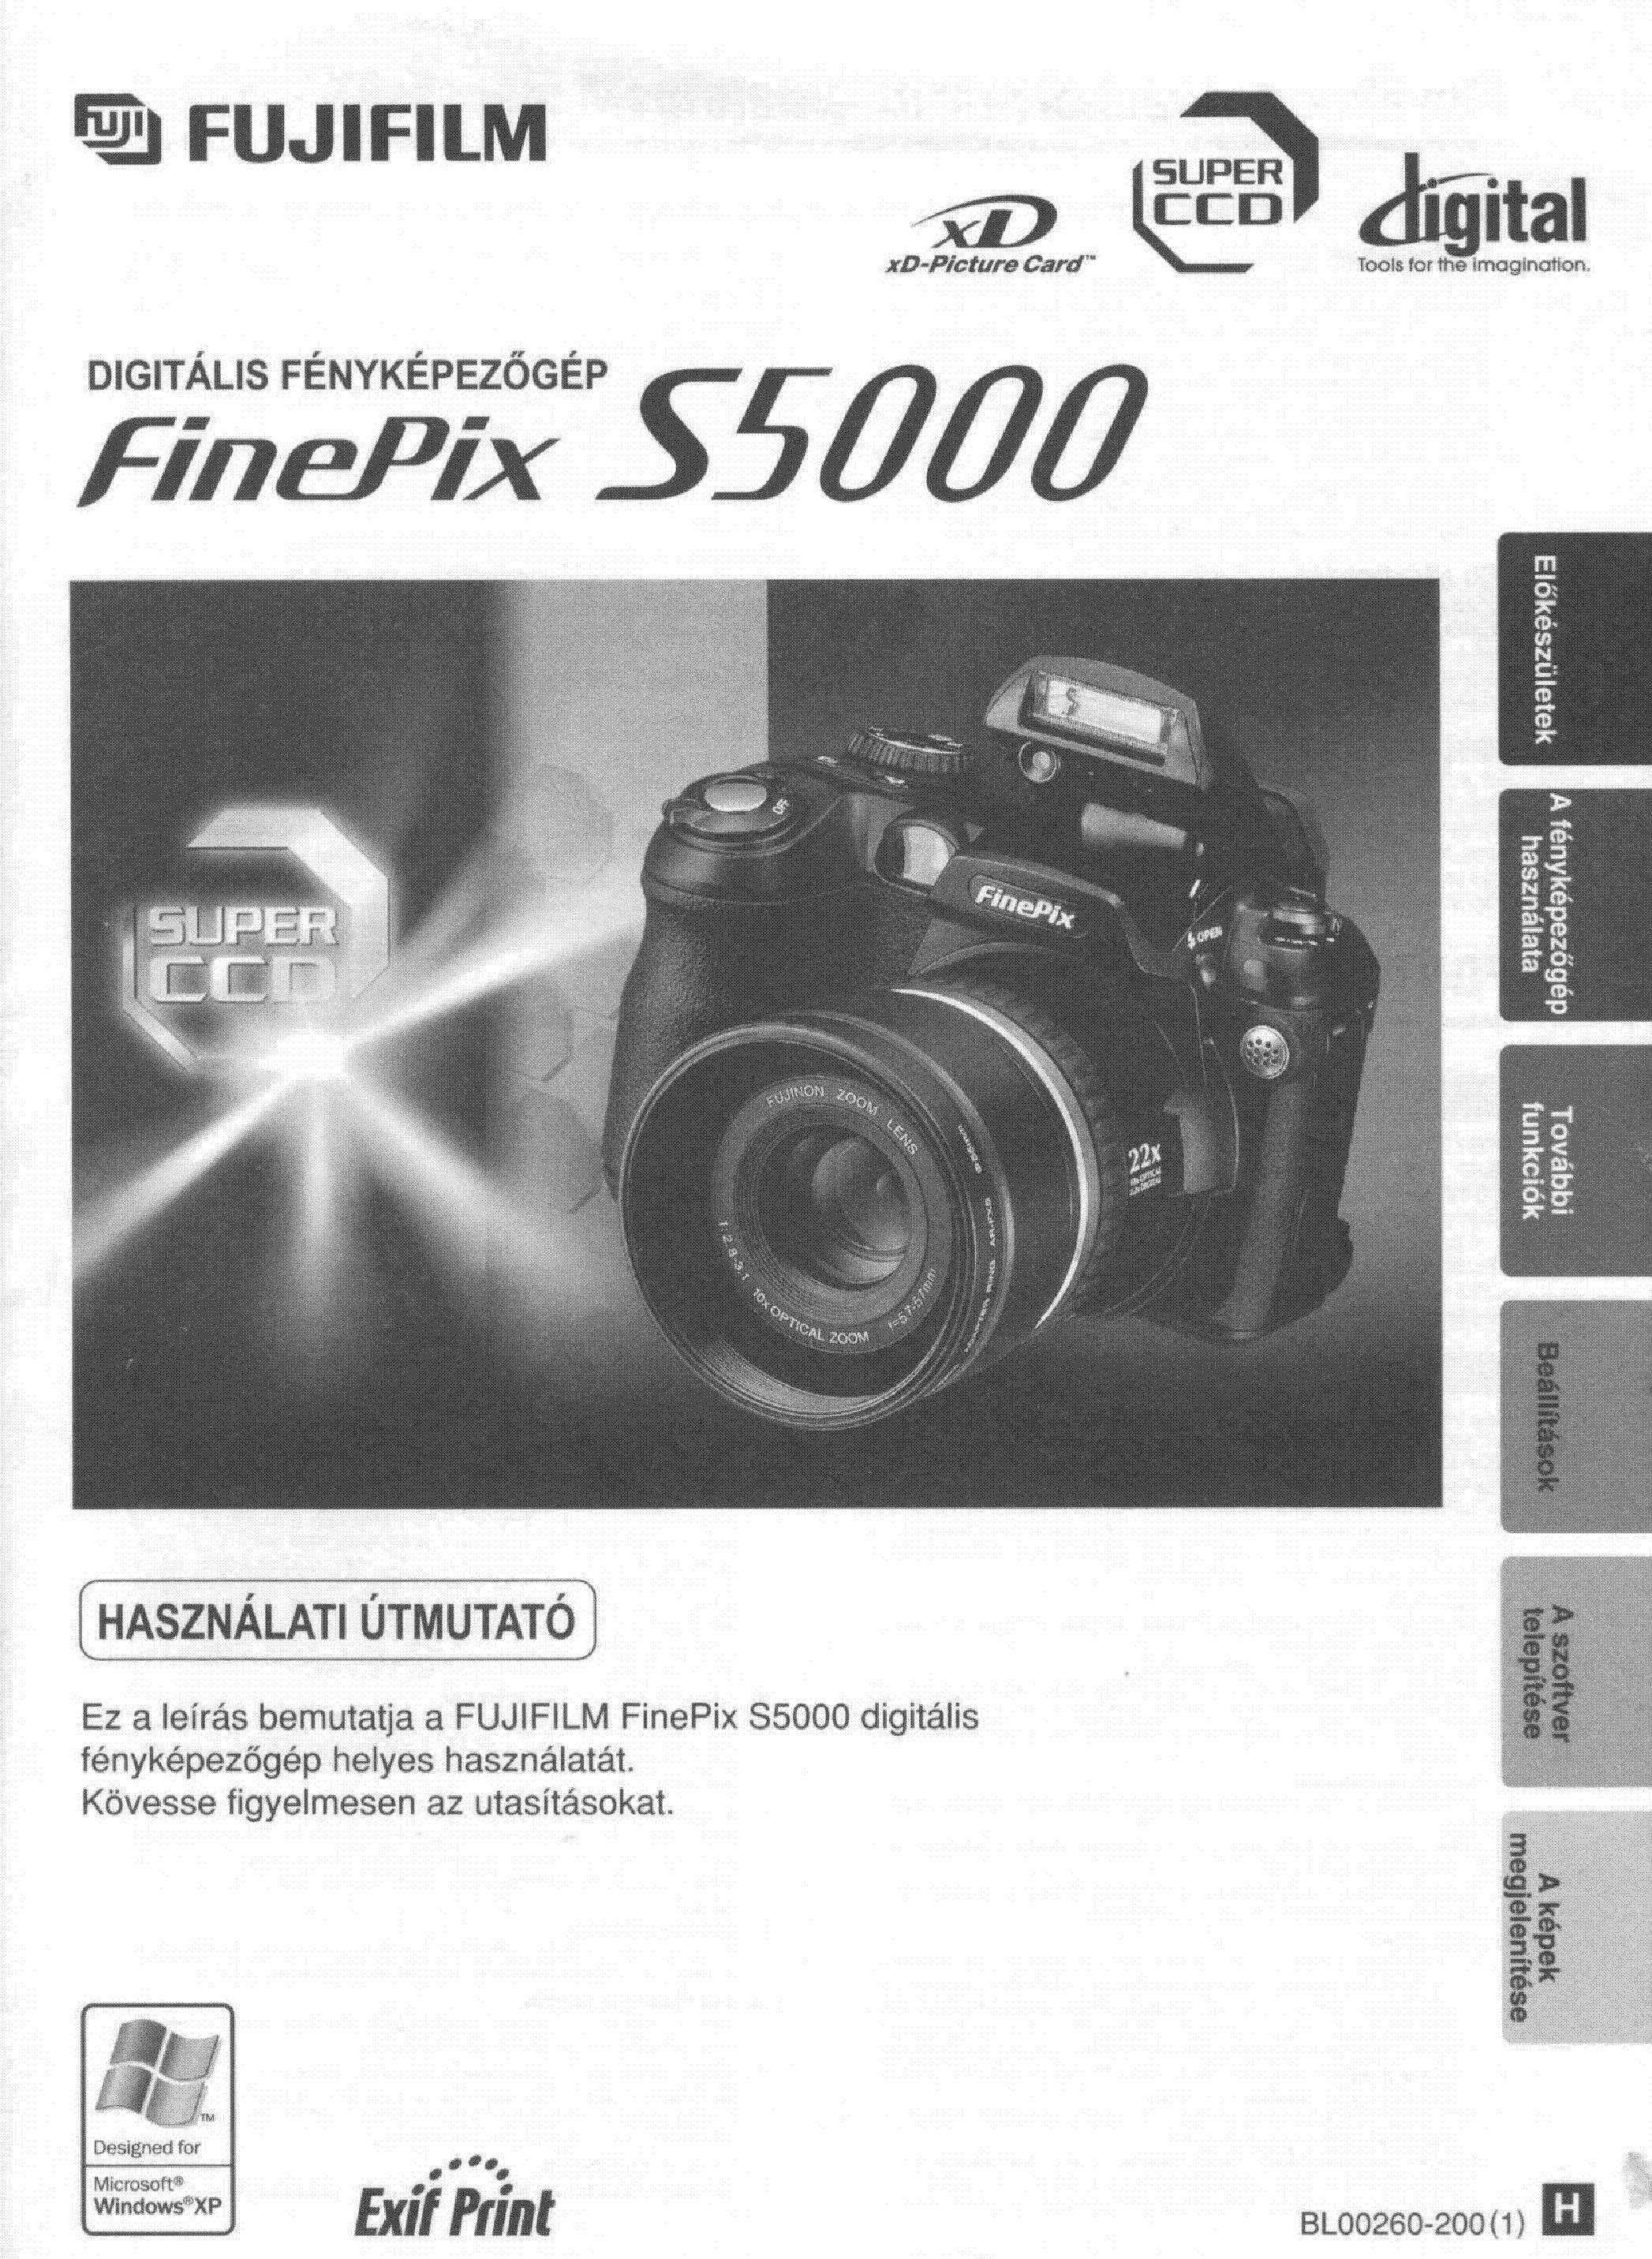 FUJIFILM FUJIFILM FINEPIX S5000 USER MANUAL service manual (1st page)